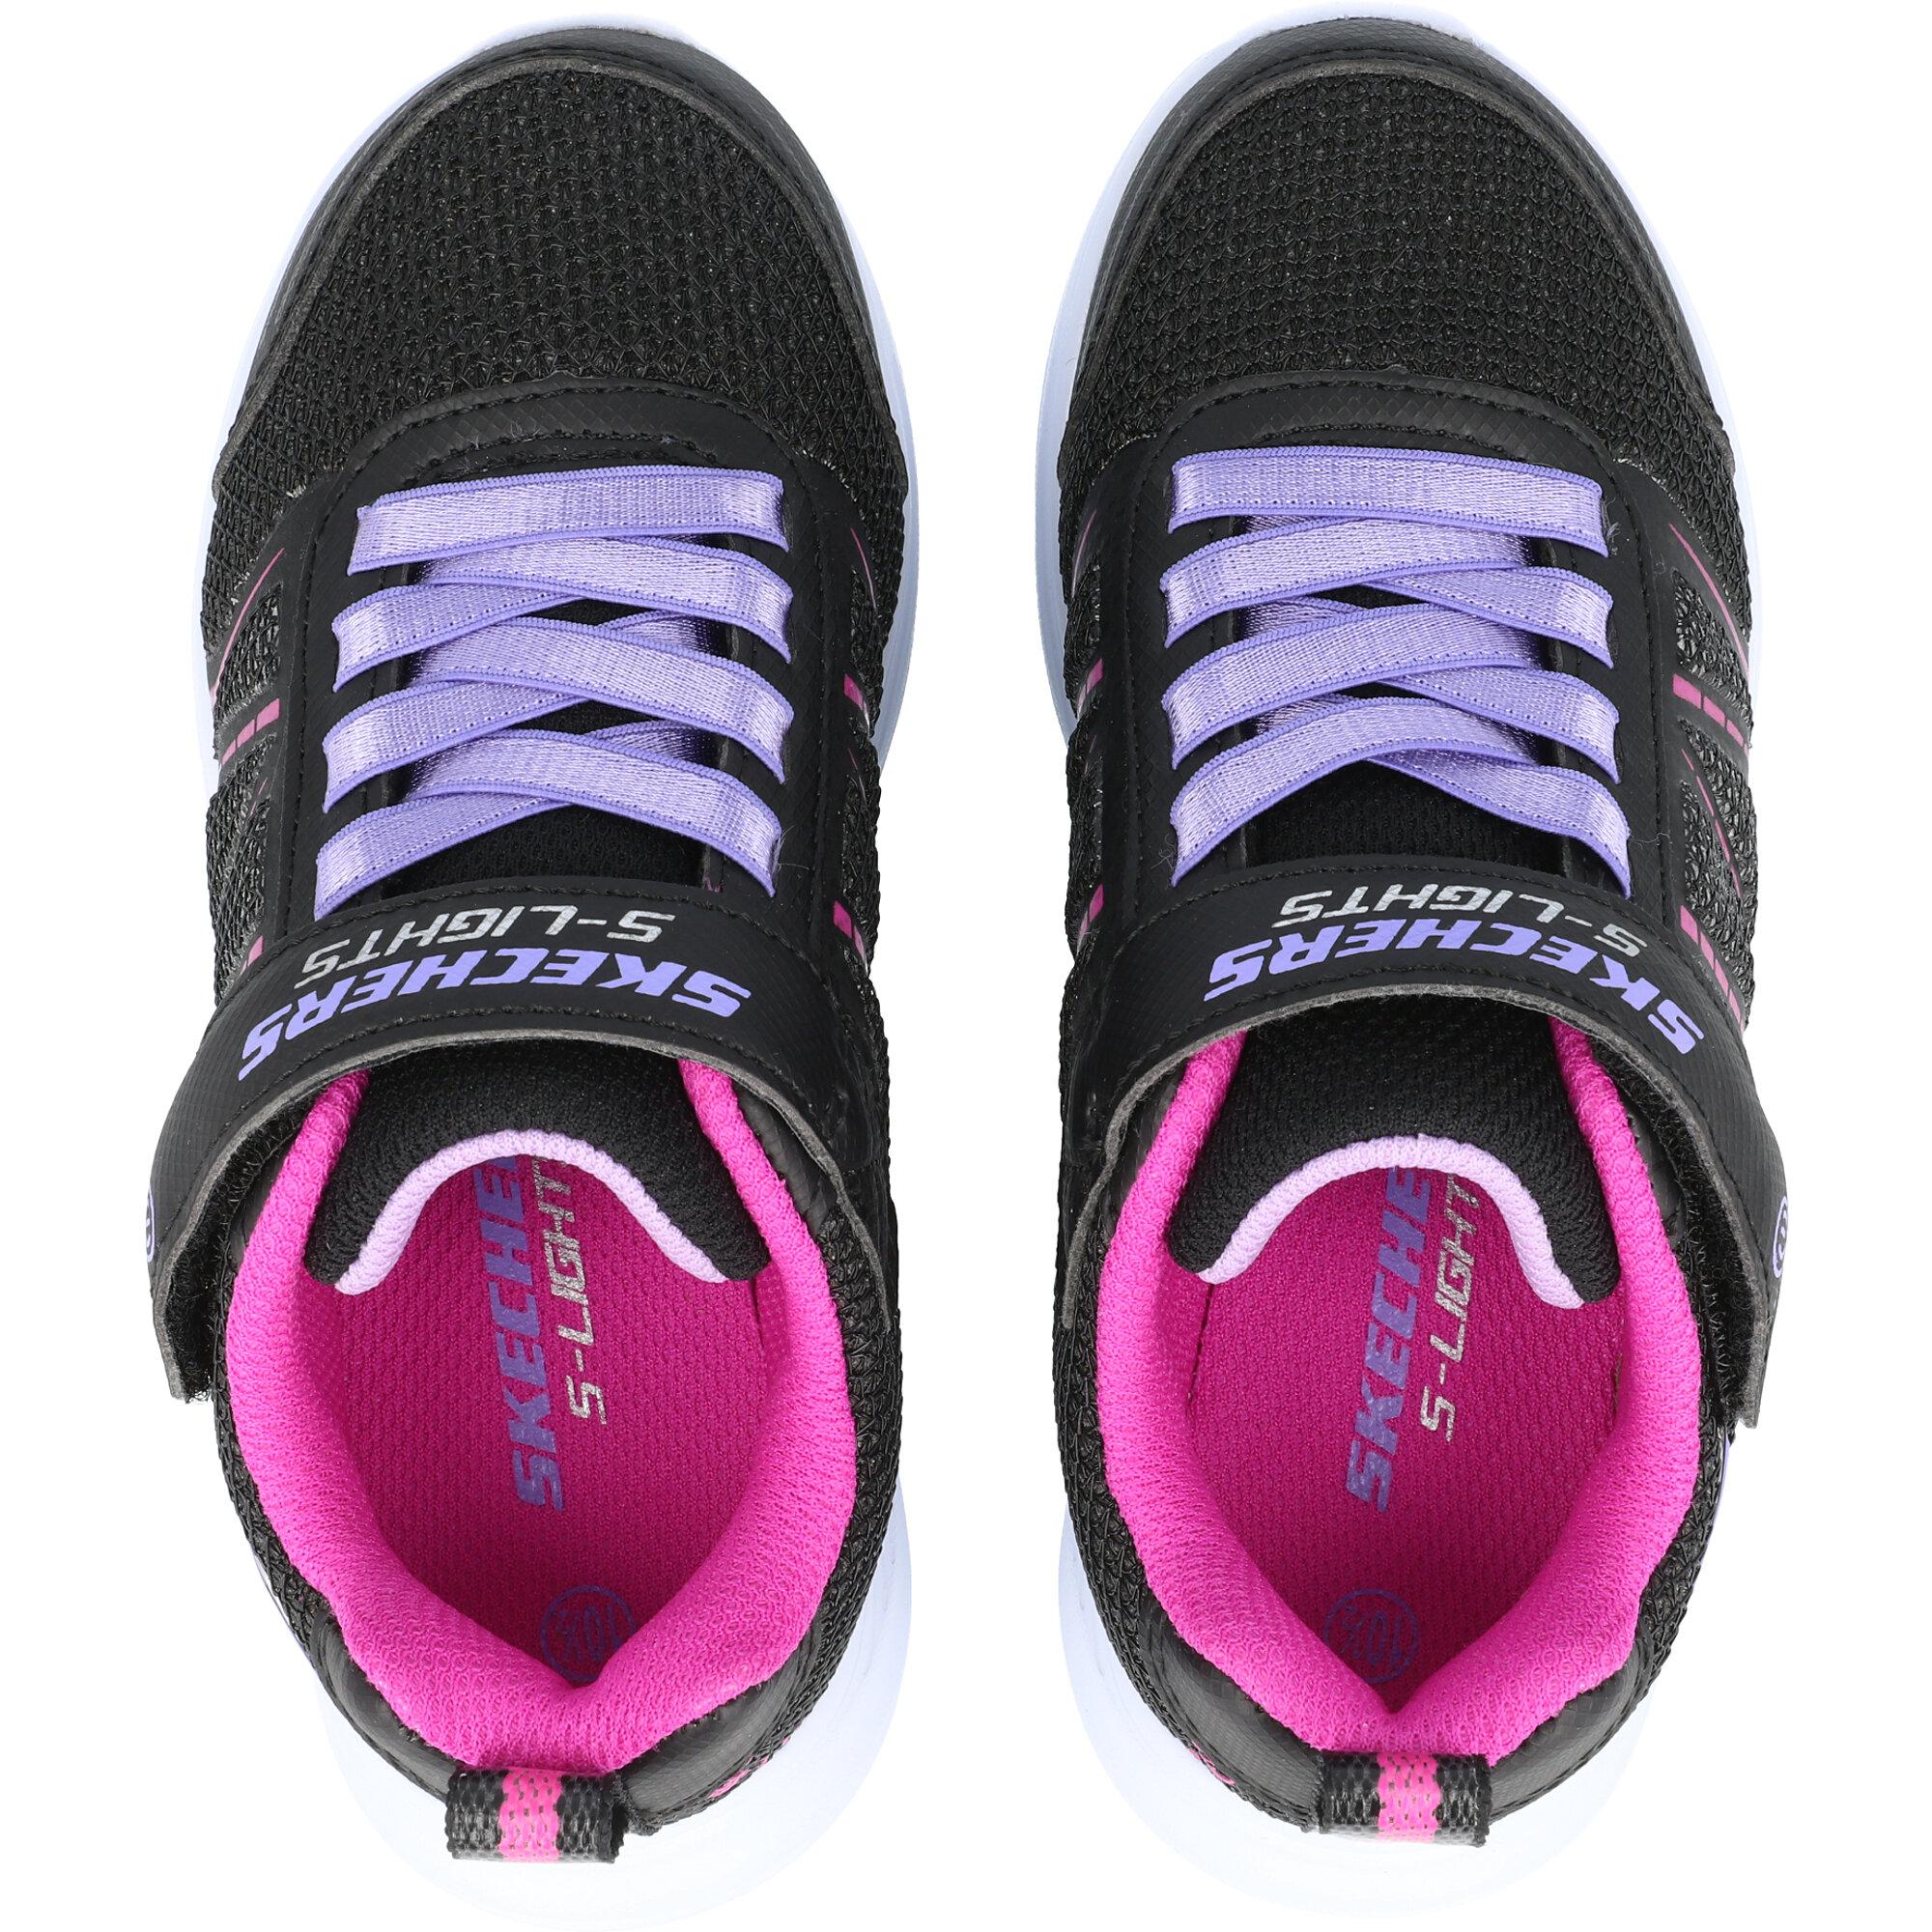 Skechers Glimmer Kicks Shimmy Brights Black Synthetic